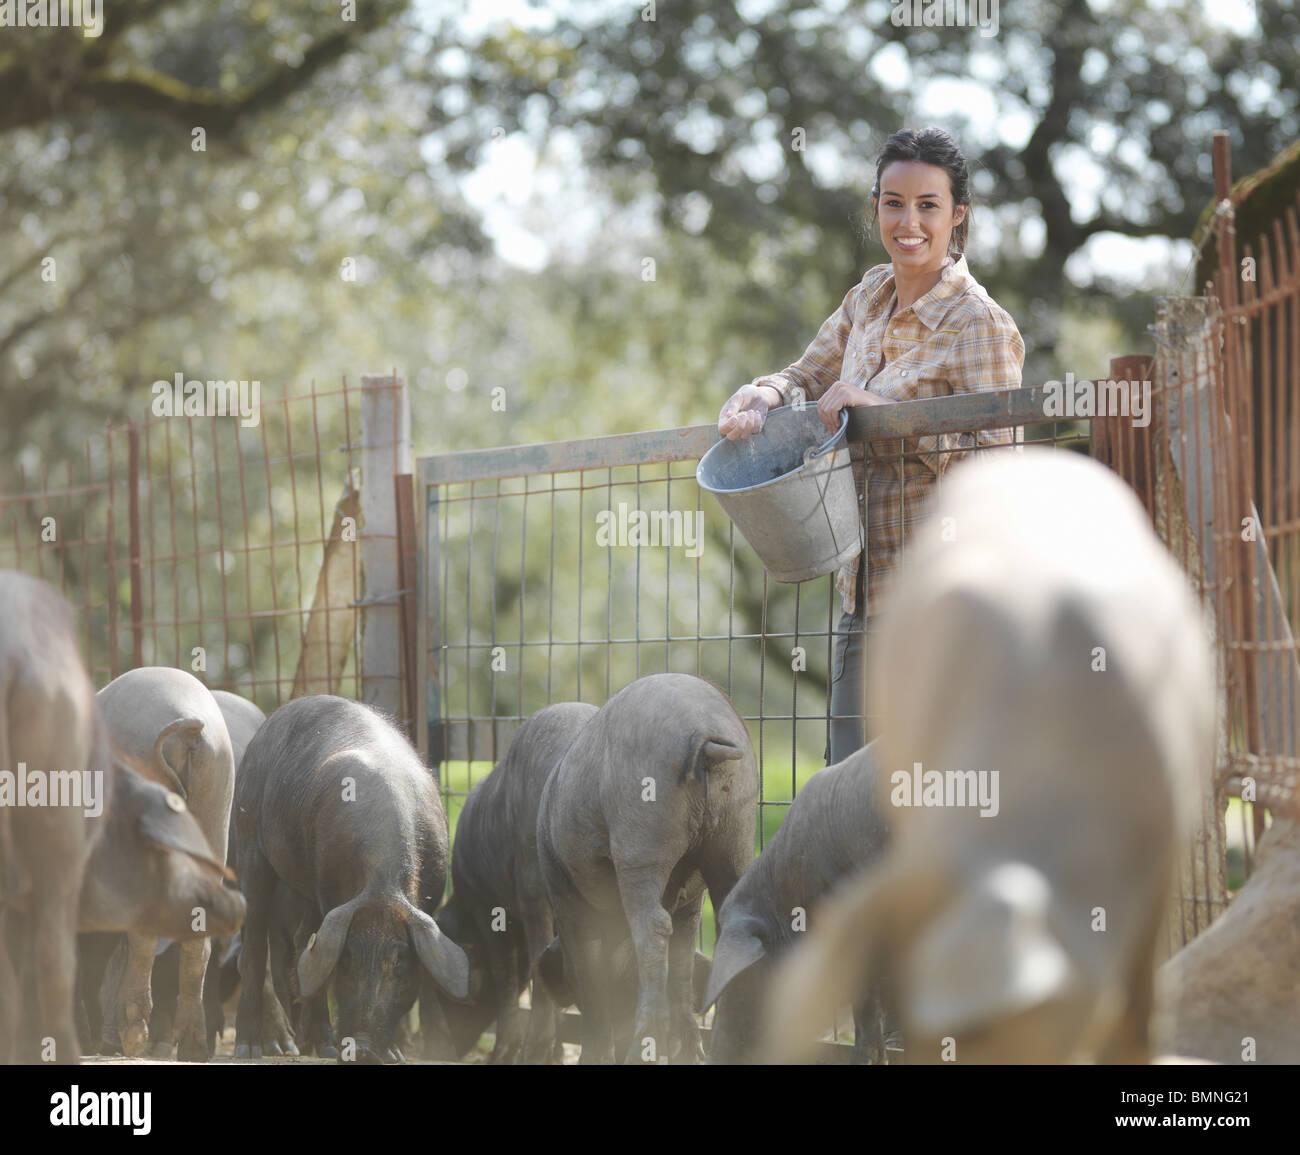 Woman on farm feeding pigs - Stock Image